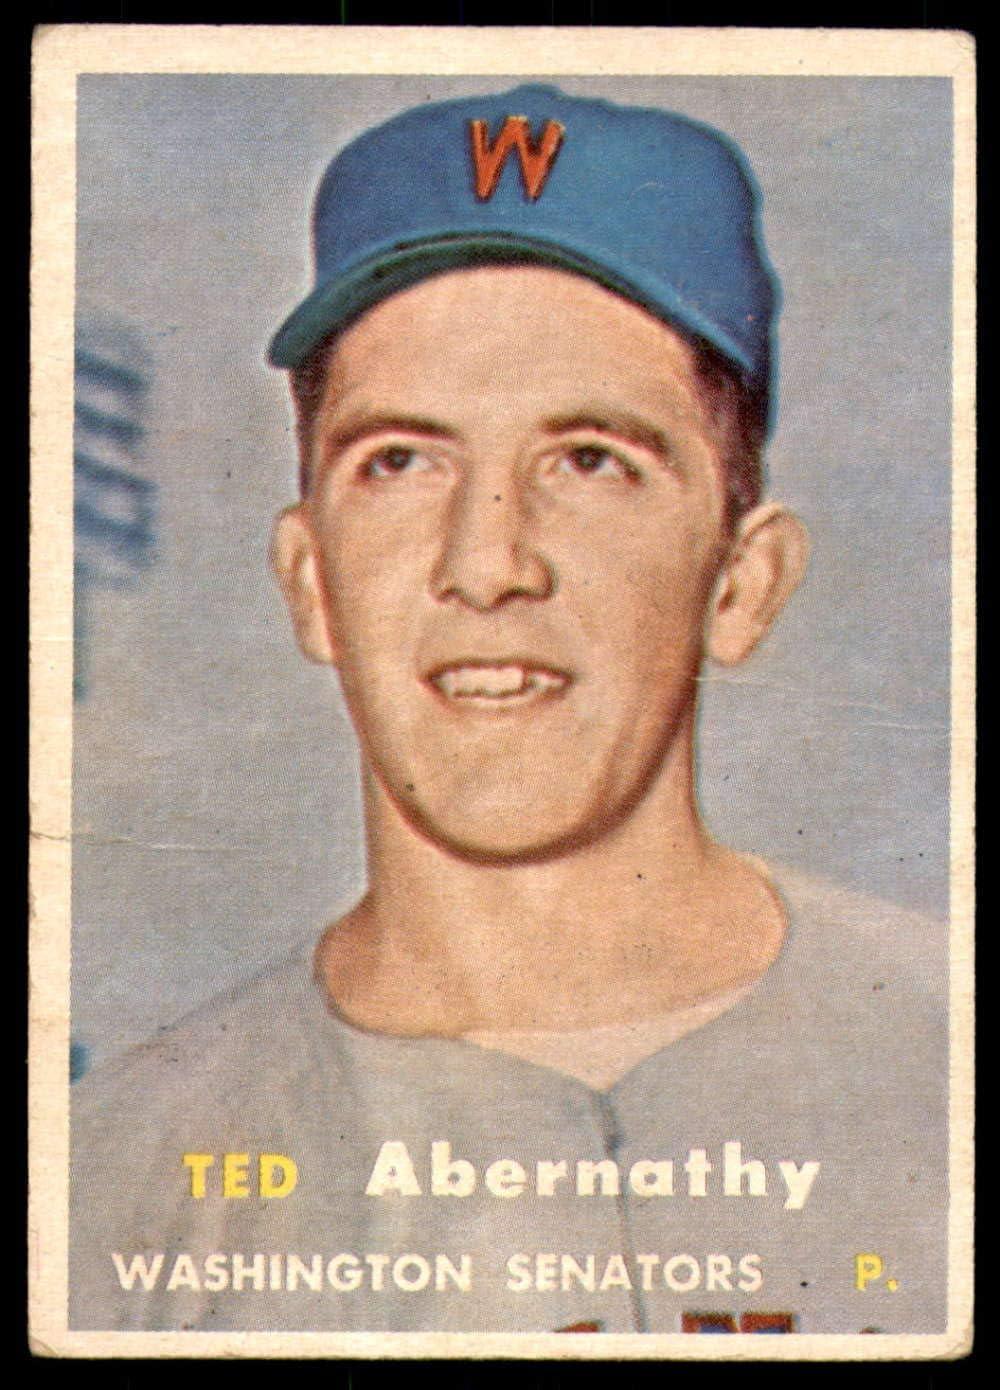 Ted Abernathy